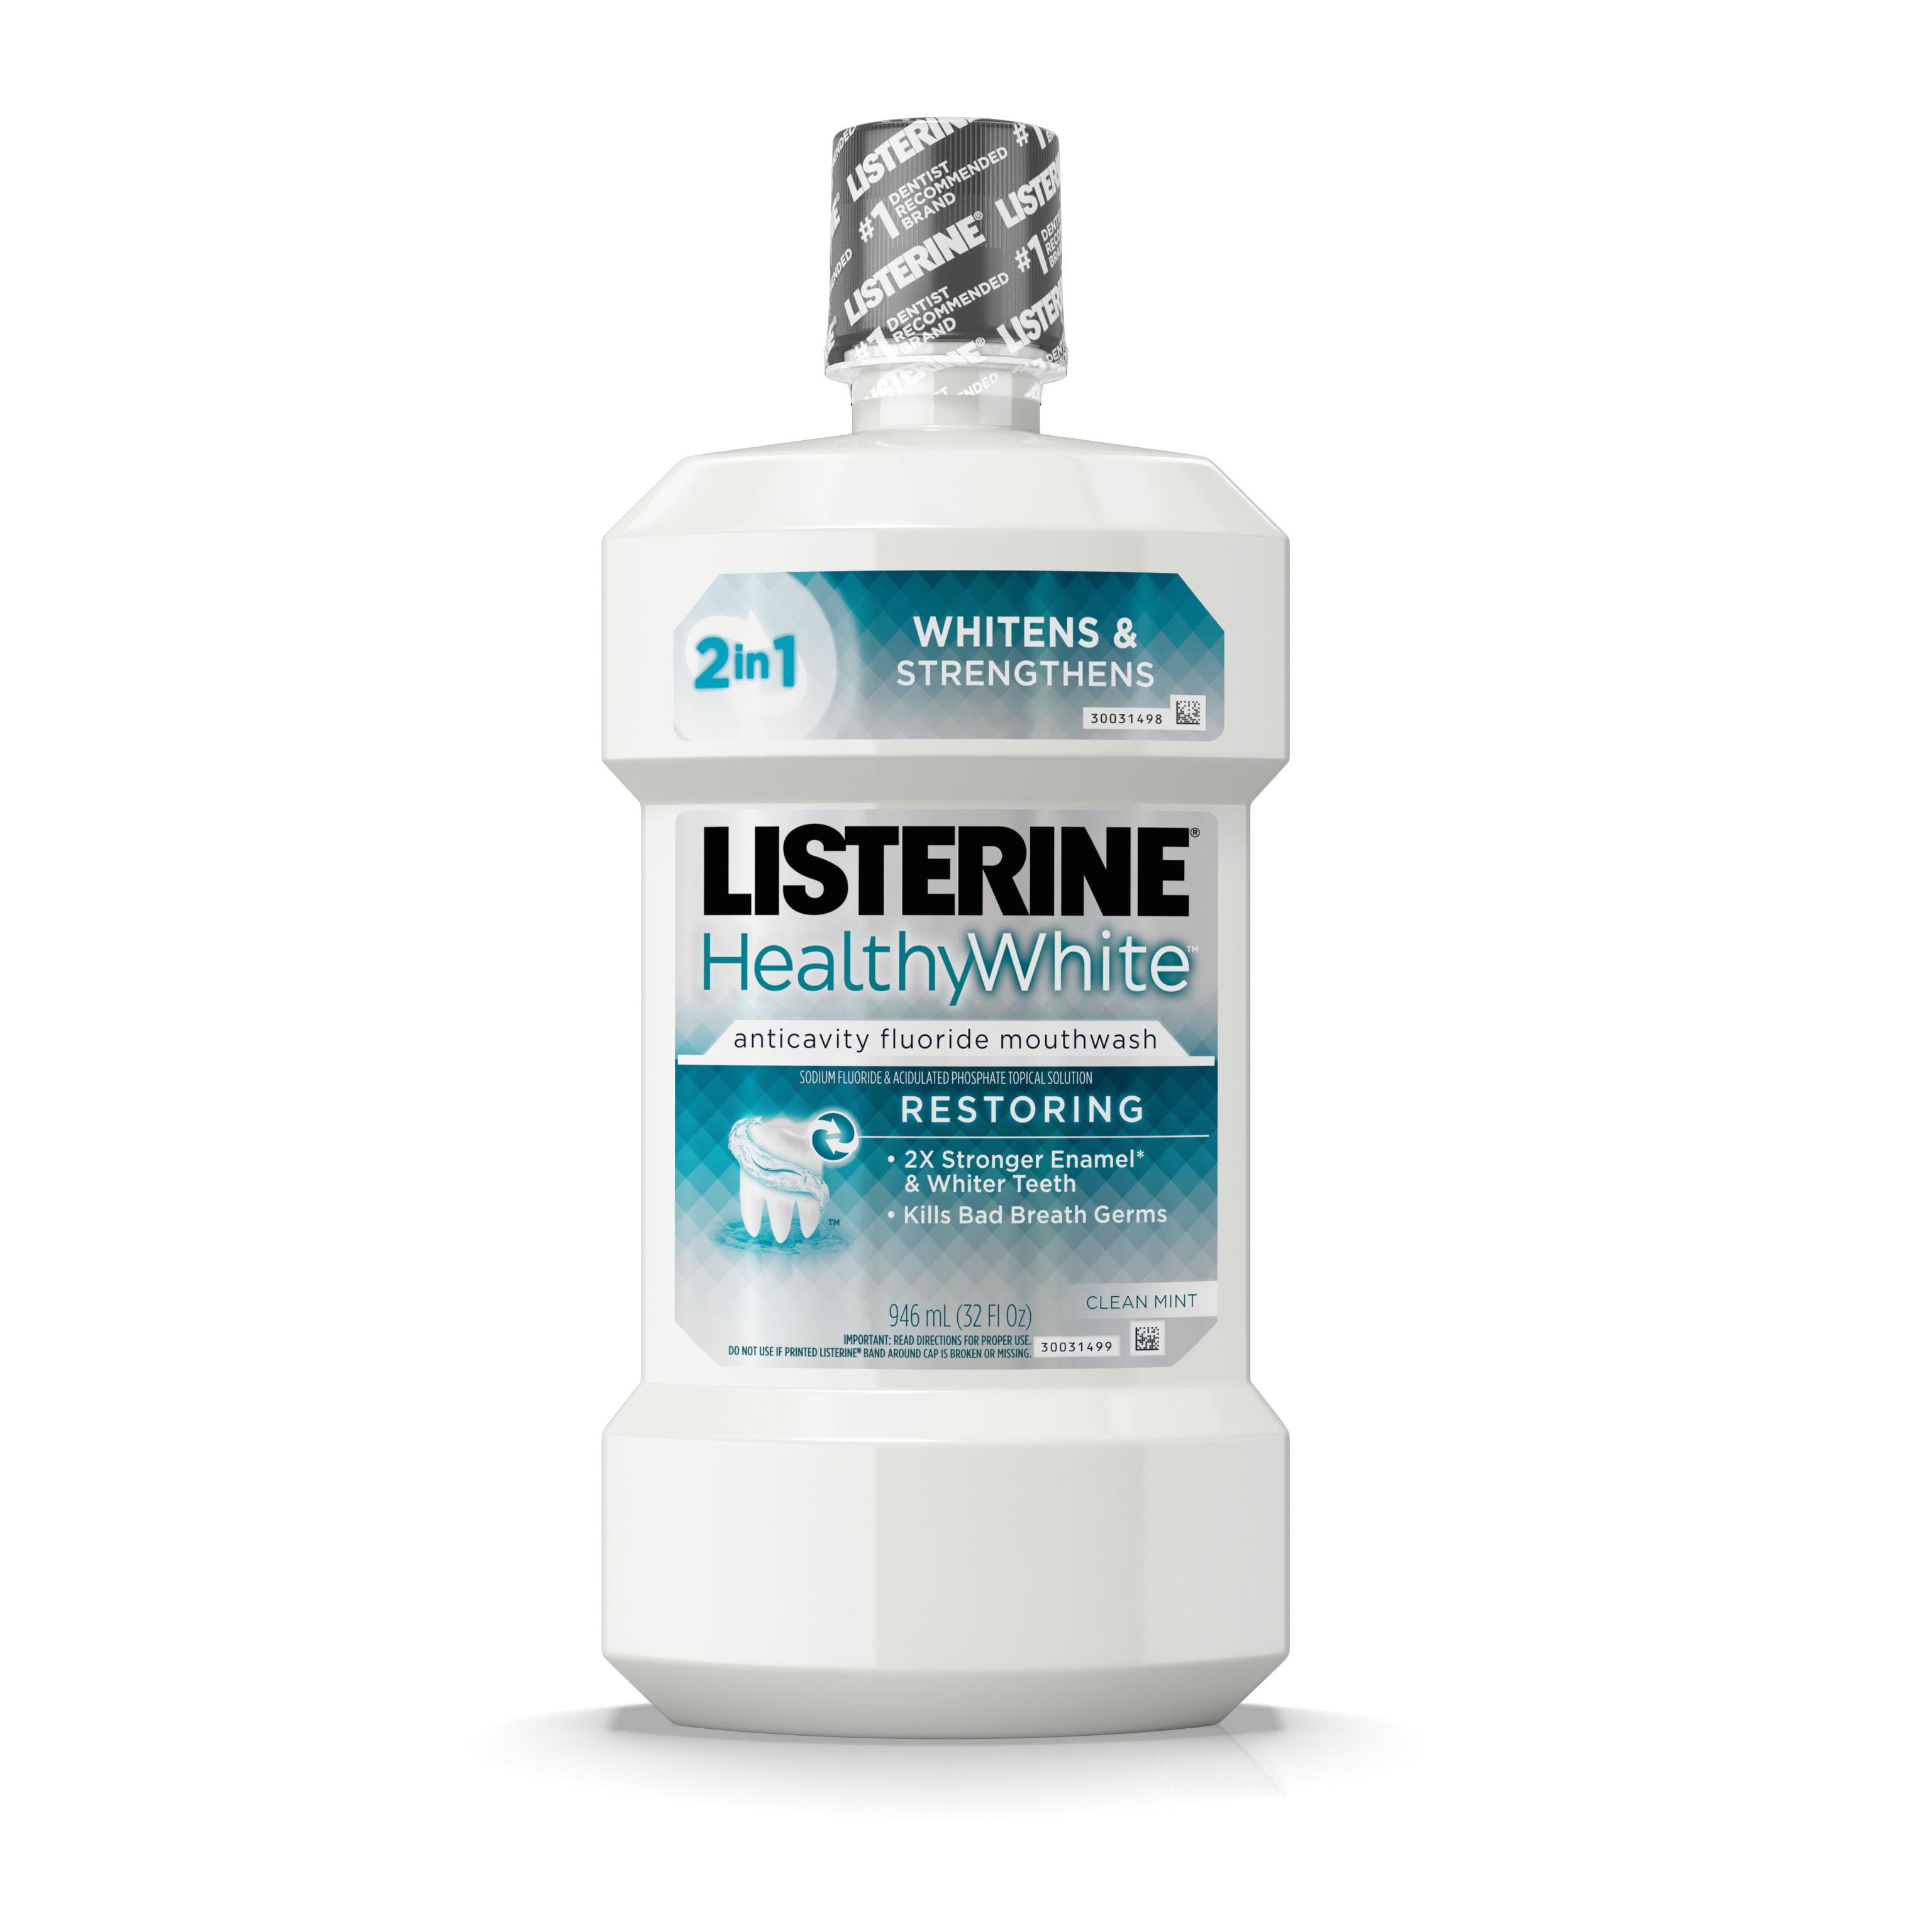 Listerine Healthy White Teeth Whitening Fluoride Mouthwash, 32 fl. oz